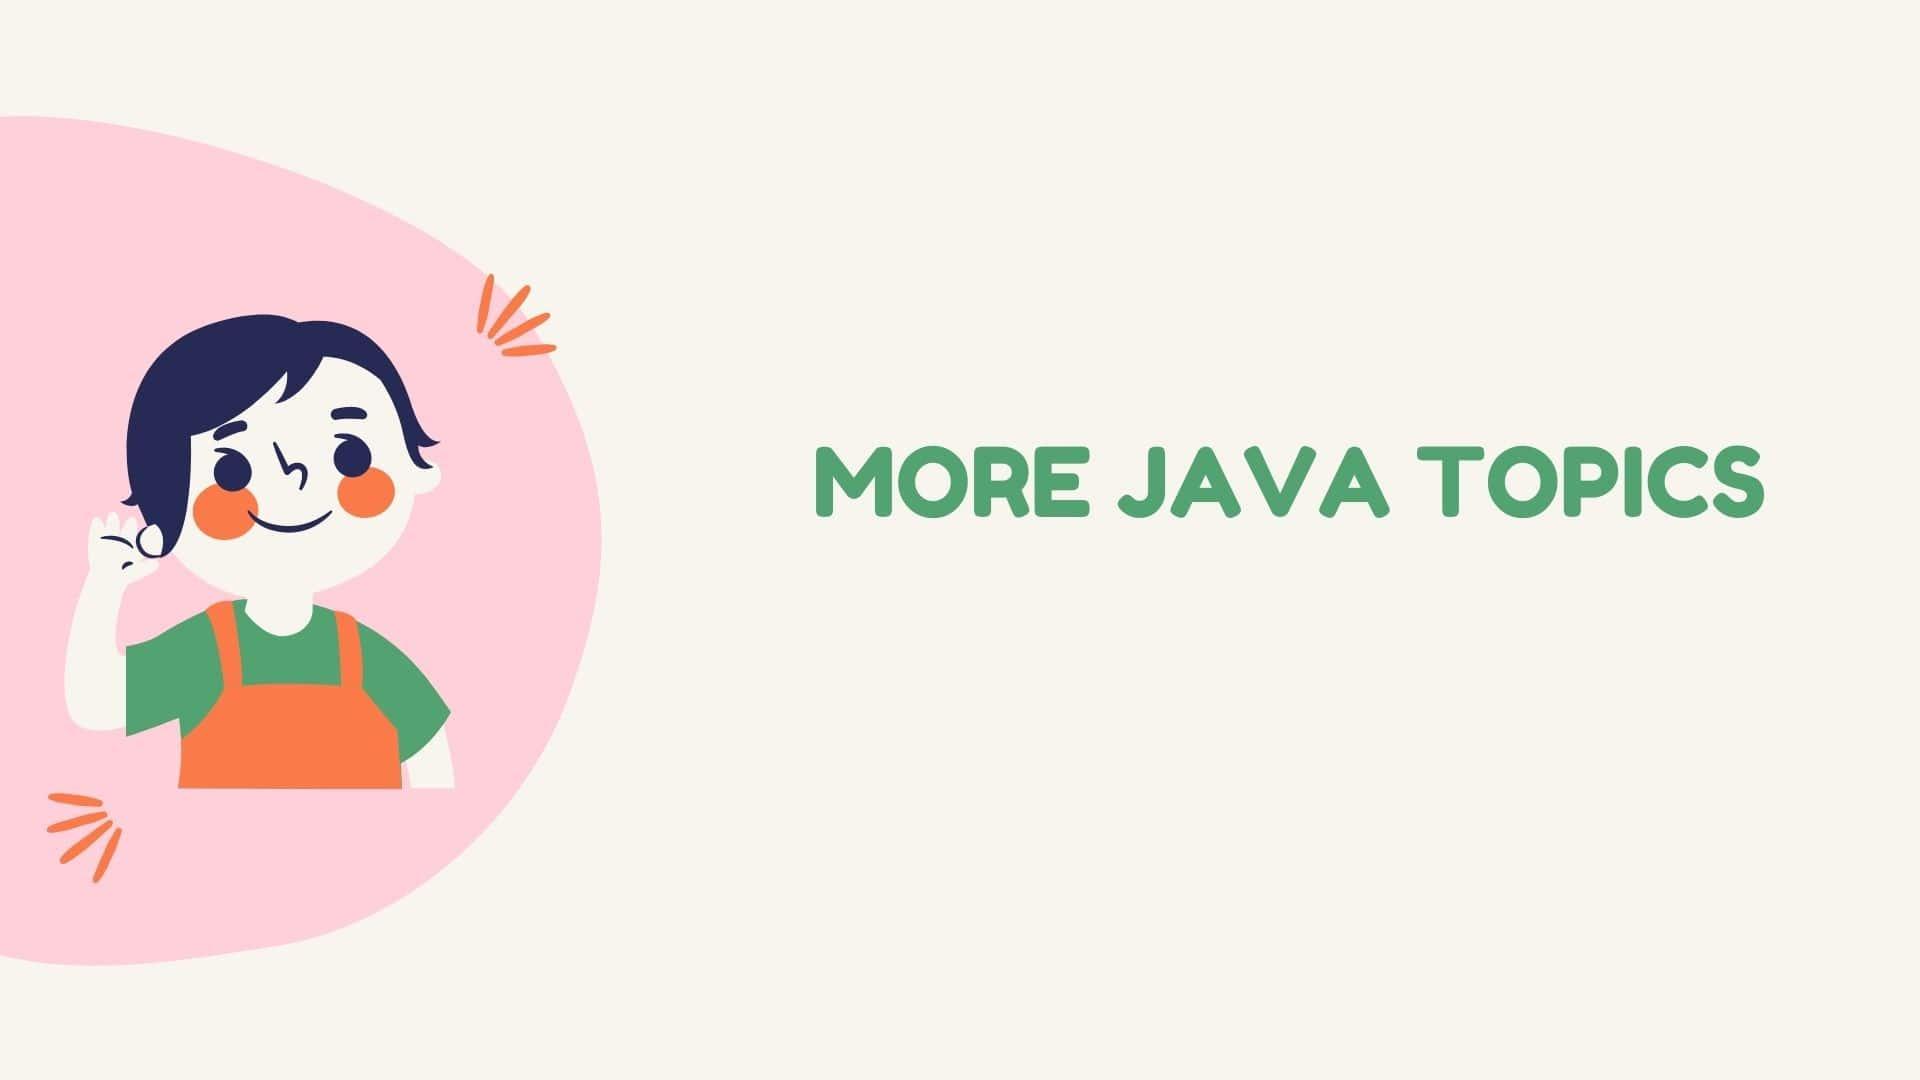 More Java Topics